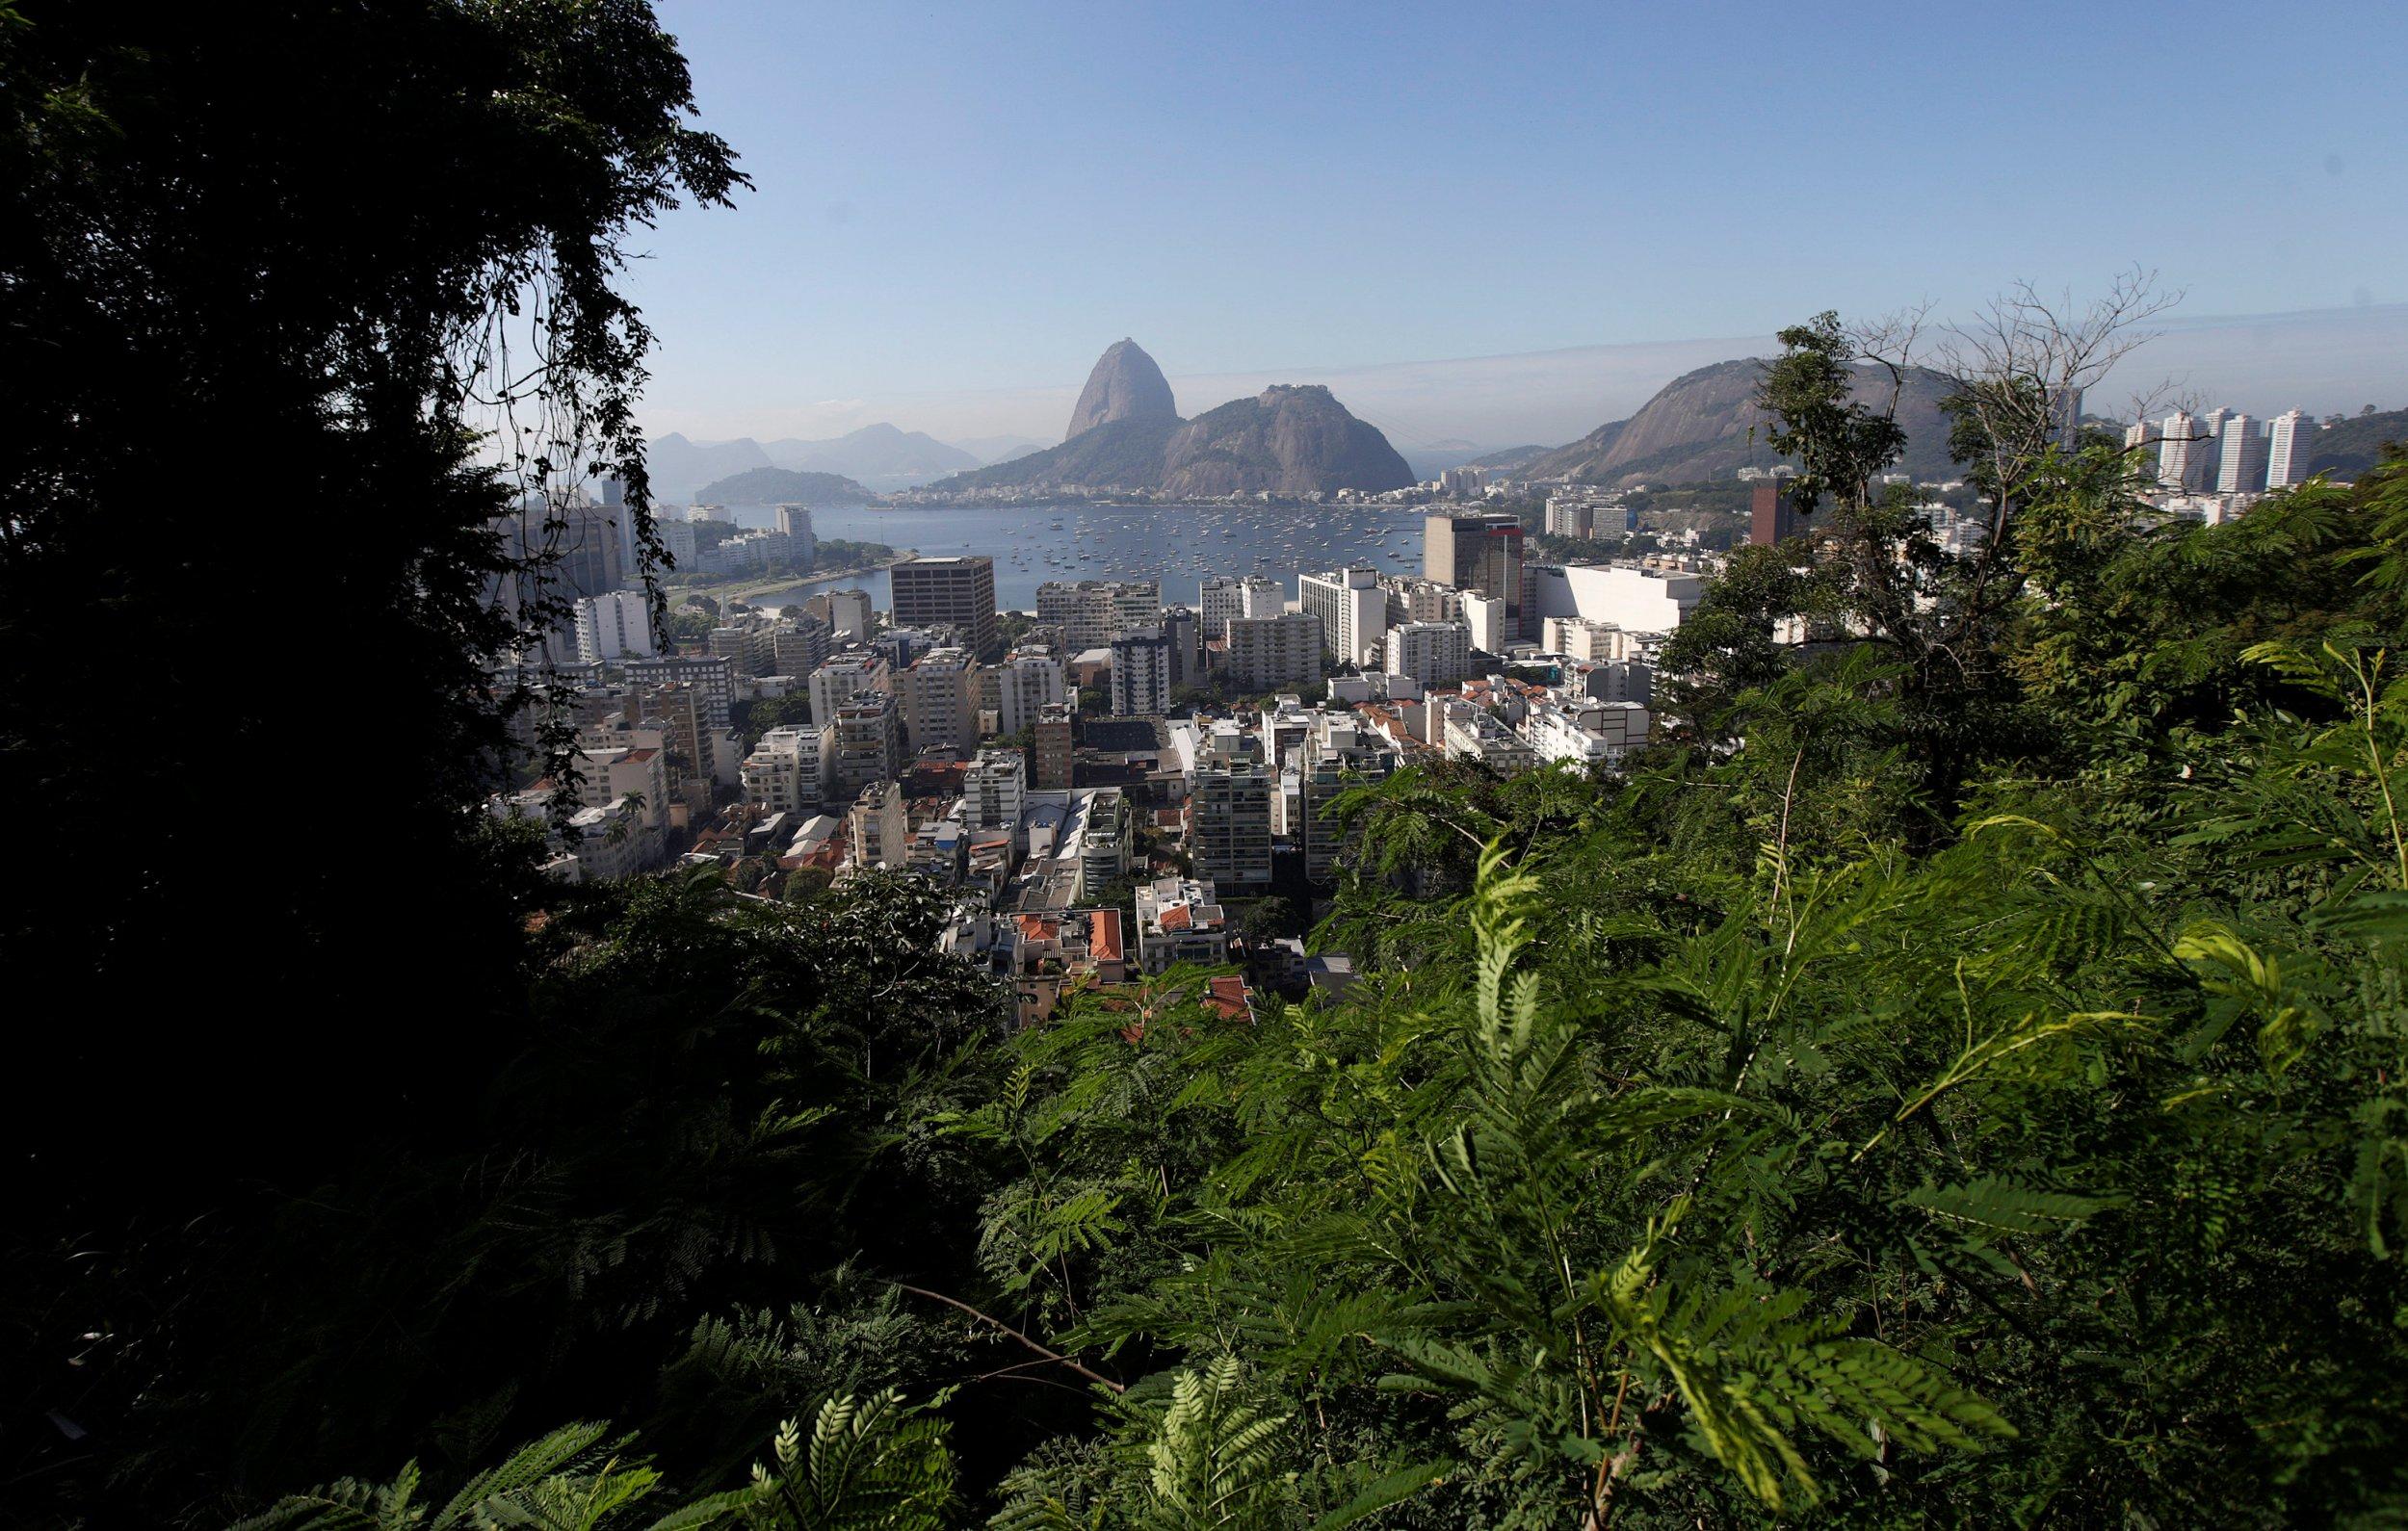 2016-06-15T184723Z_1530647846_D1AETKCDJVAB_RTRMADP_3_OLYMPICS-RIO-ACCOMODATION